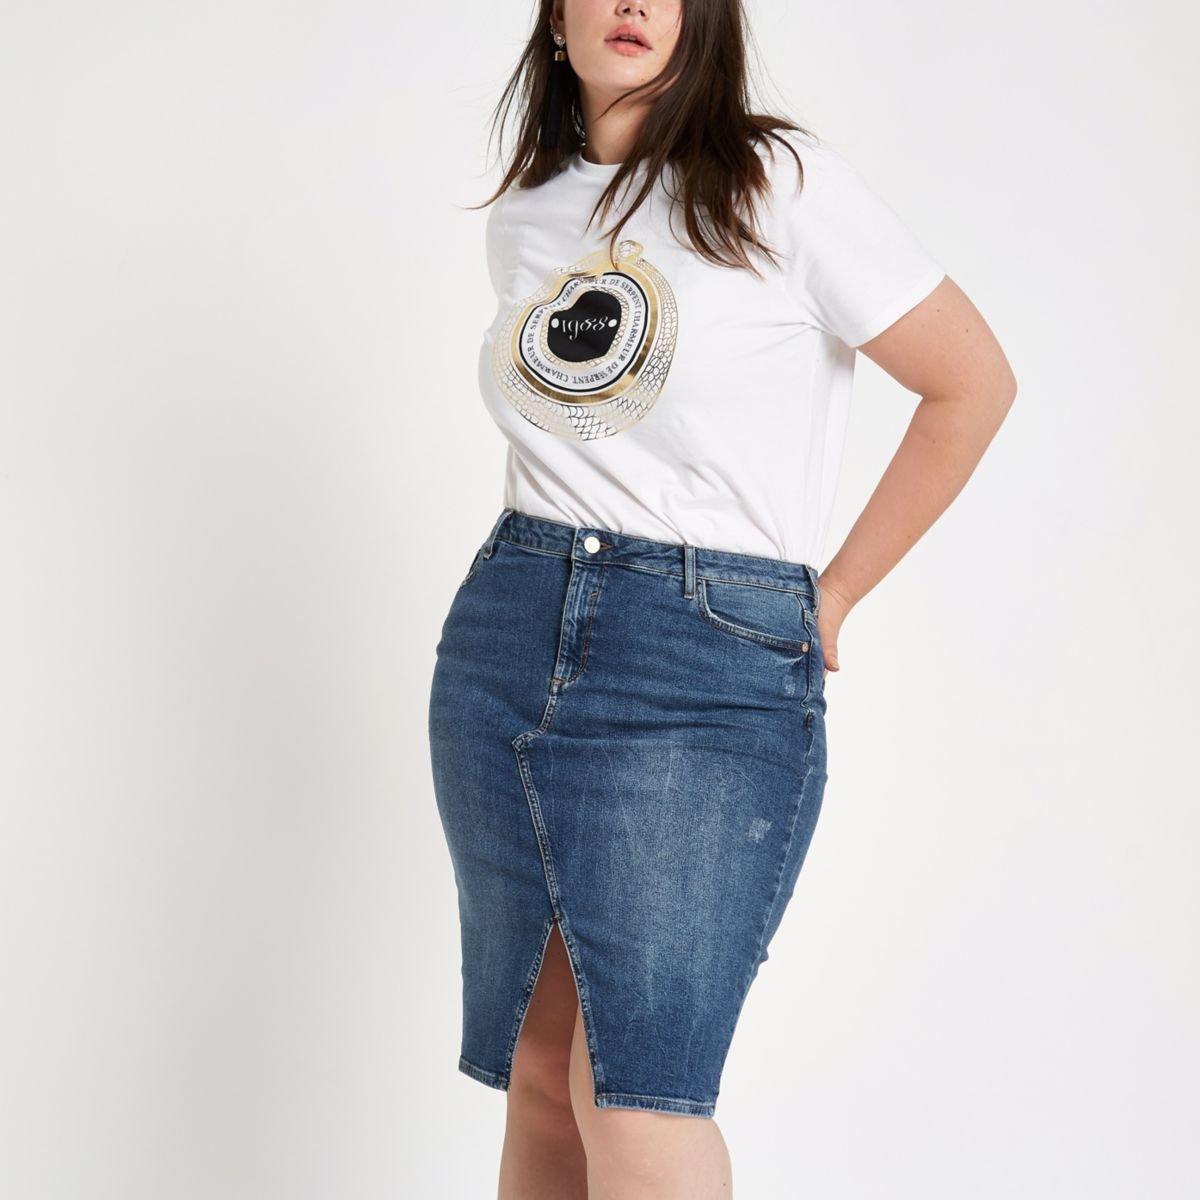 Curvy milf jean skirt | Porn images)